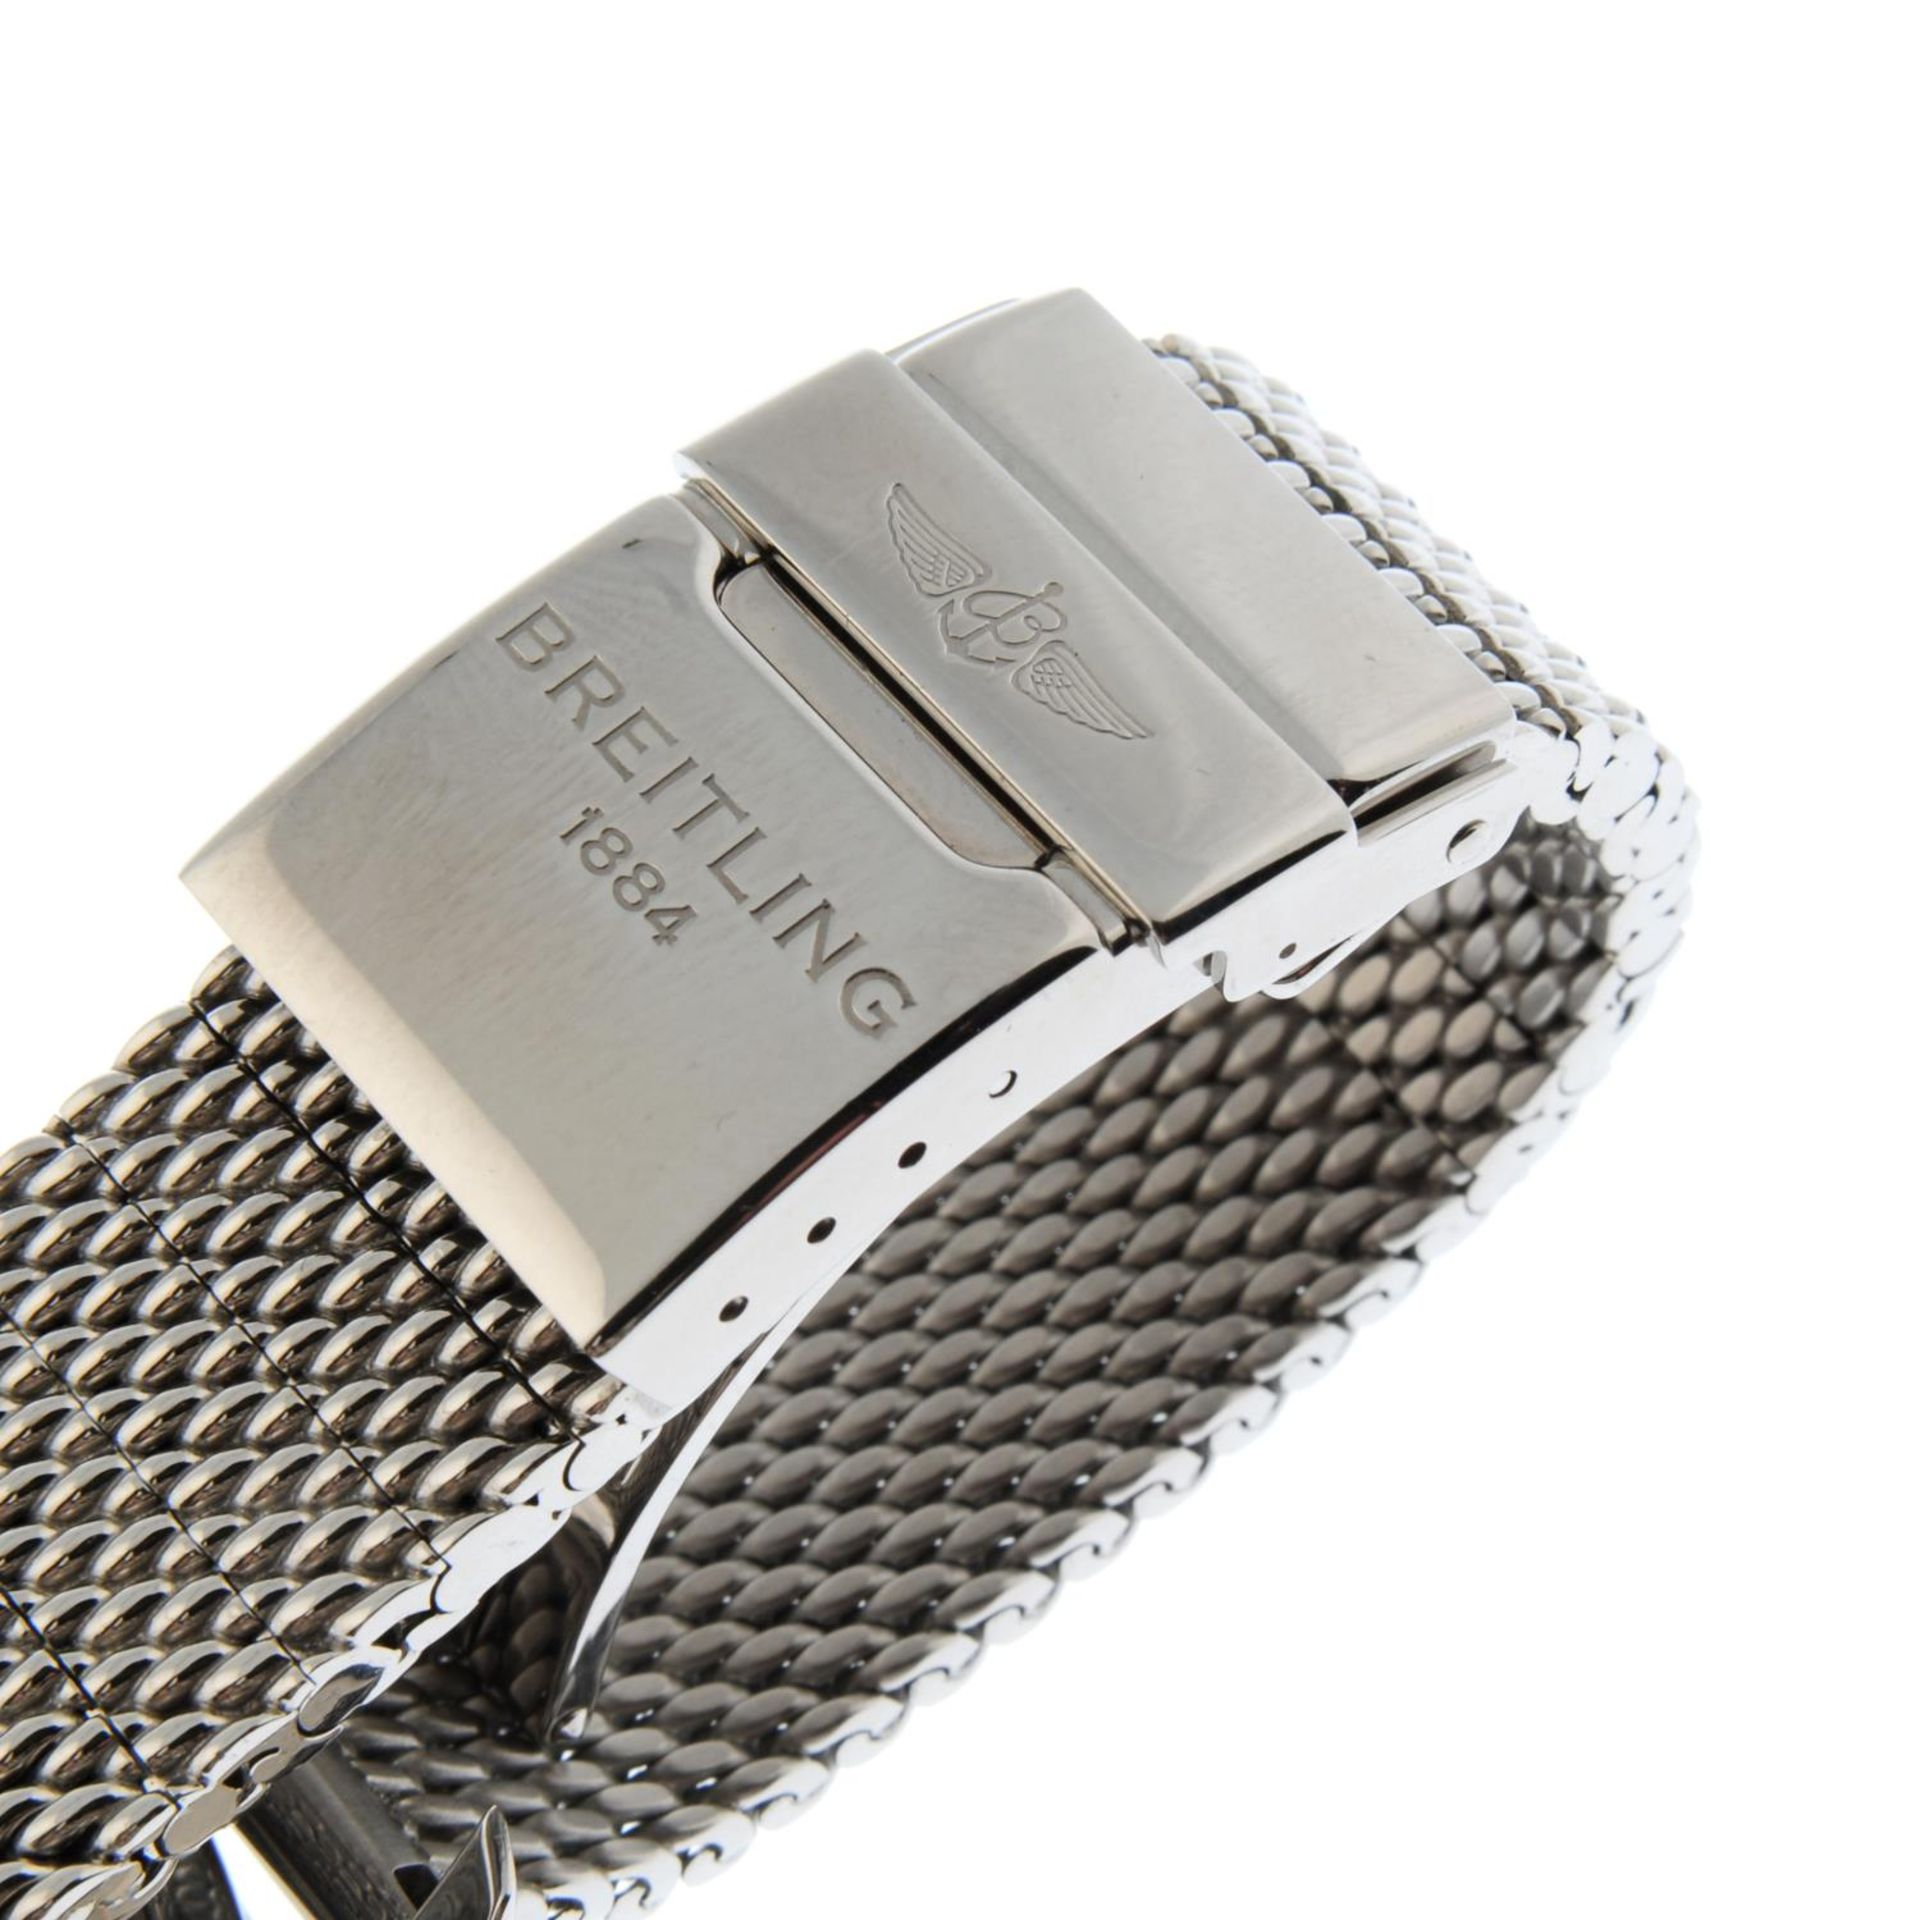 BREITLING - a SuperOcean Heritage 46 bracelet watch. - Bild 4 aus 6